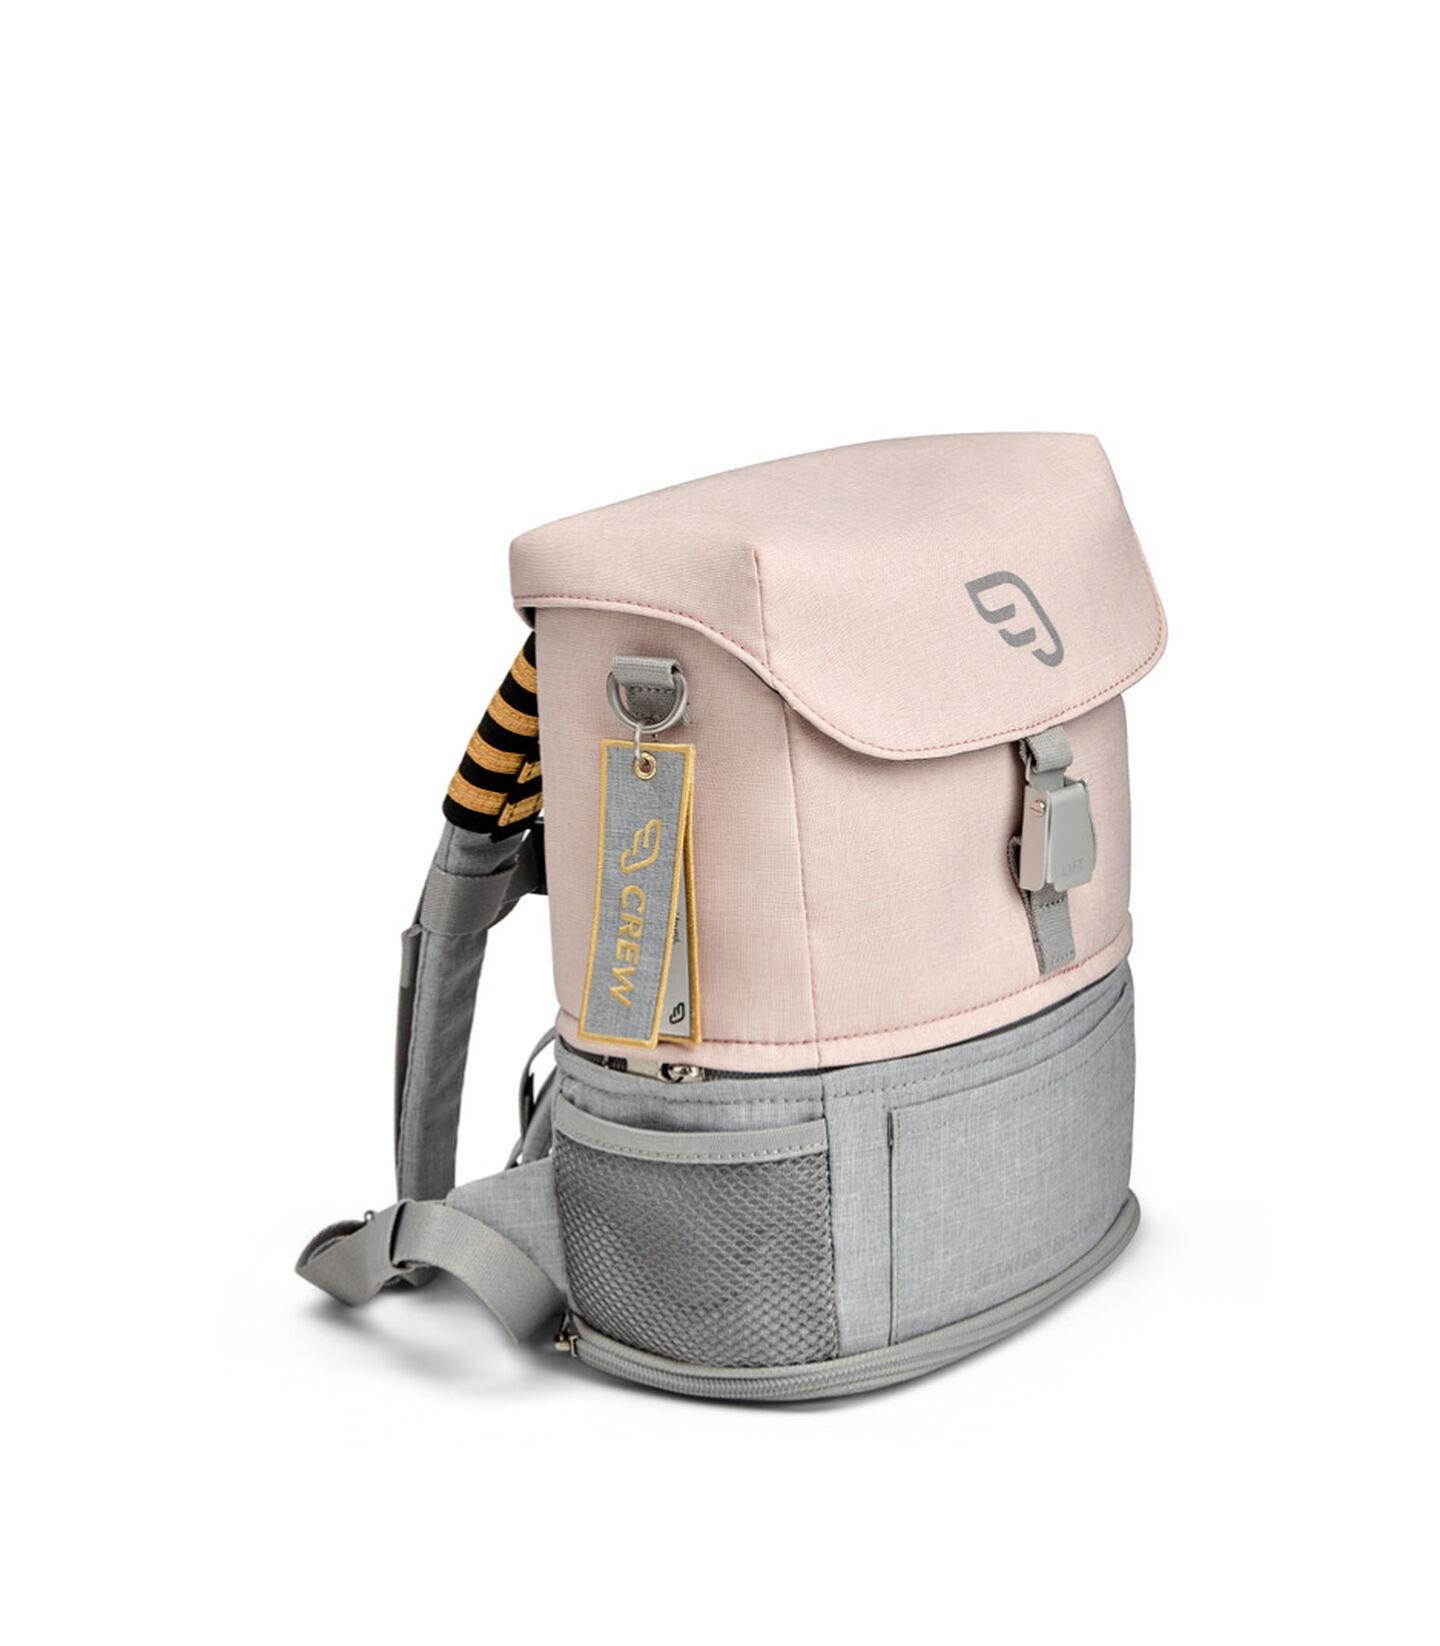 JETKIDS Crew Backpack Pink Lemonade, Rose Limonade, mainview view 2